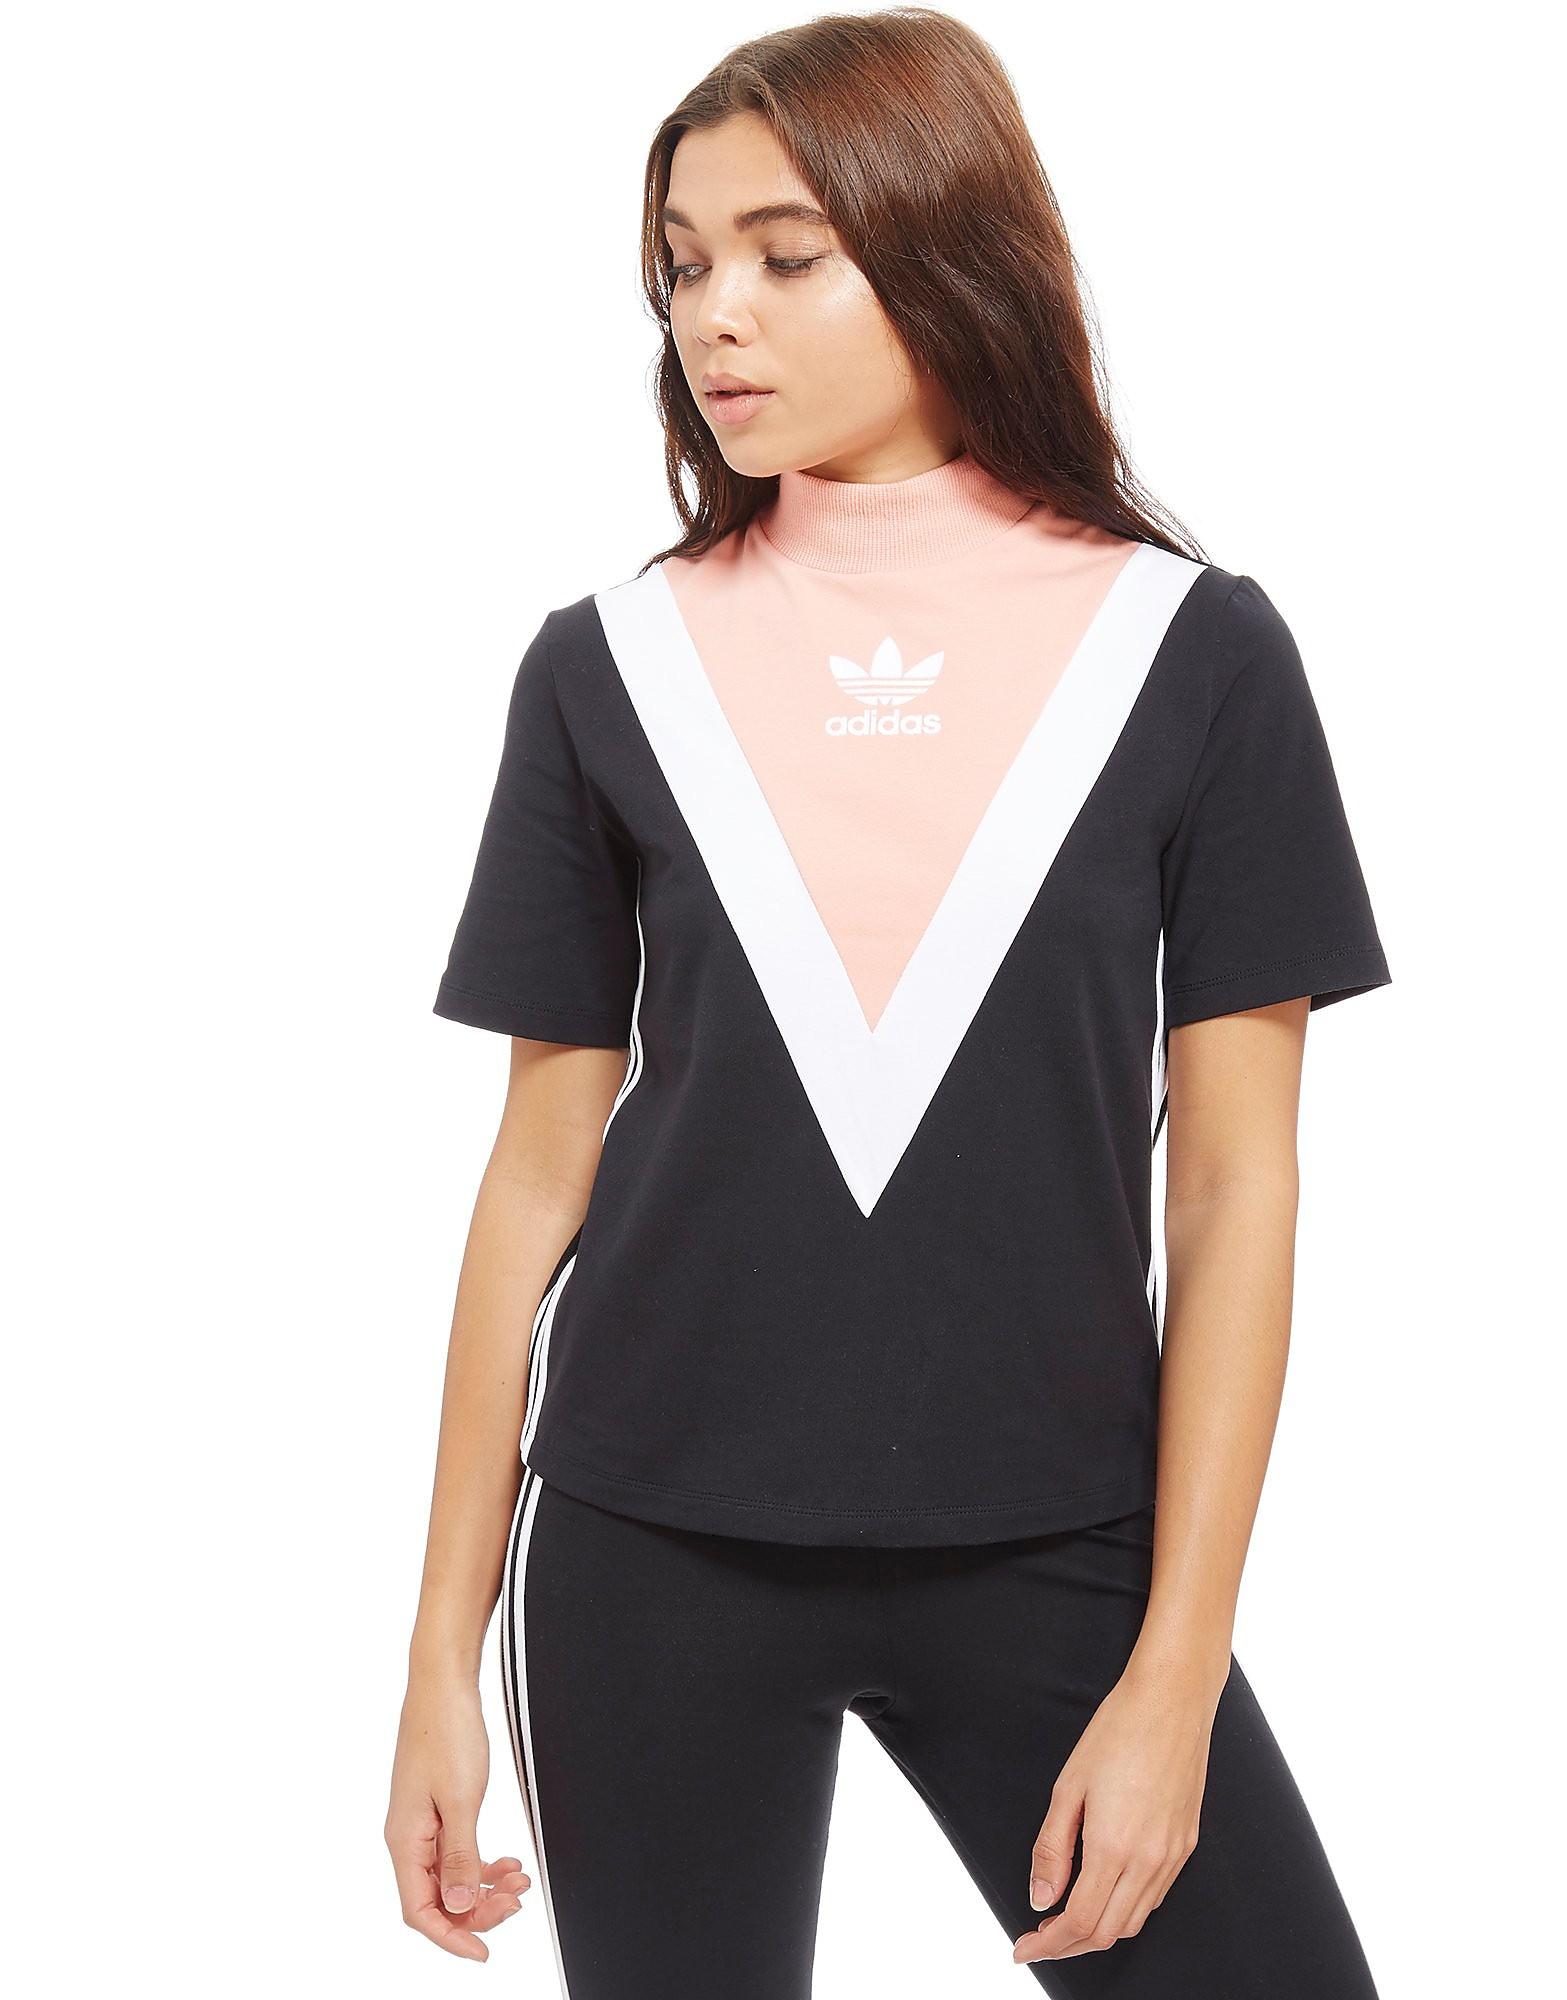 size 40 442ee 47c3e Adidas Originals adidas Originals High Neck Chevron T-Shirt - alleen bij JD  - Black